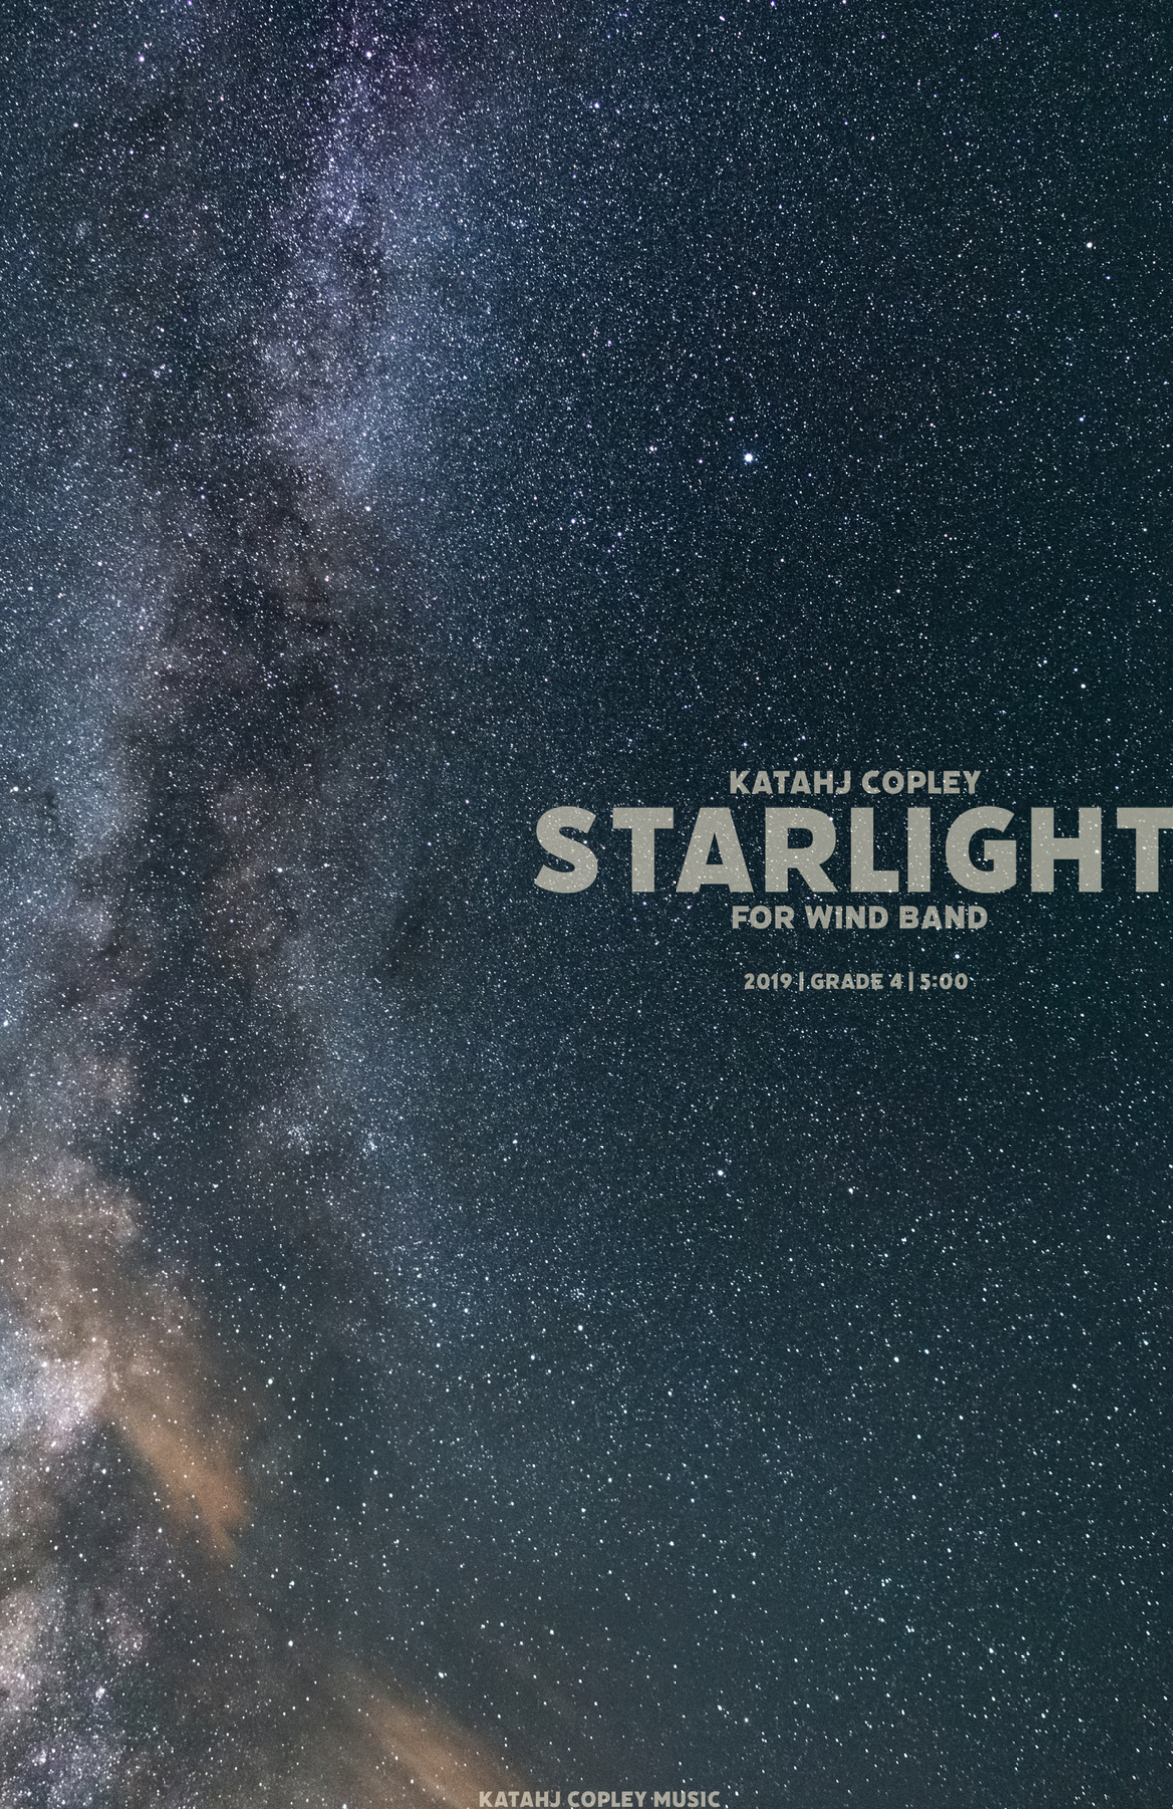 Starlight by Katahj Copley